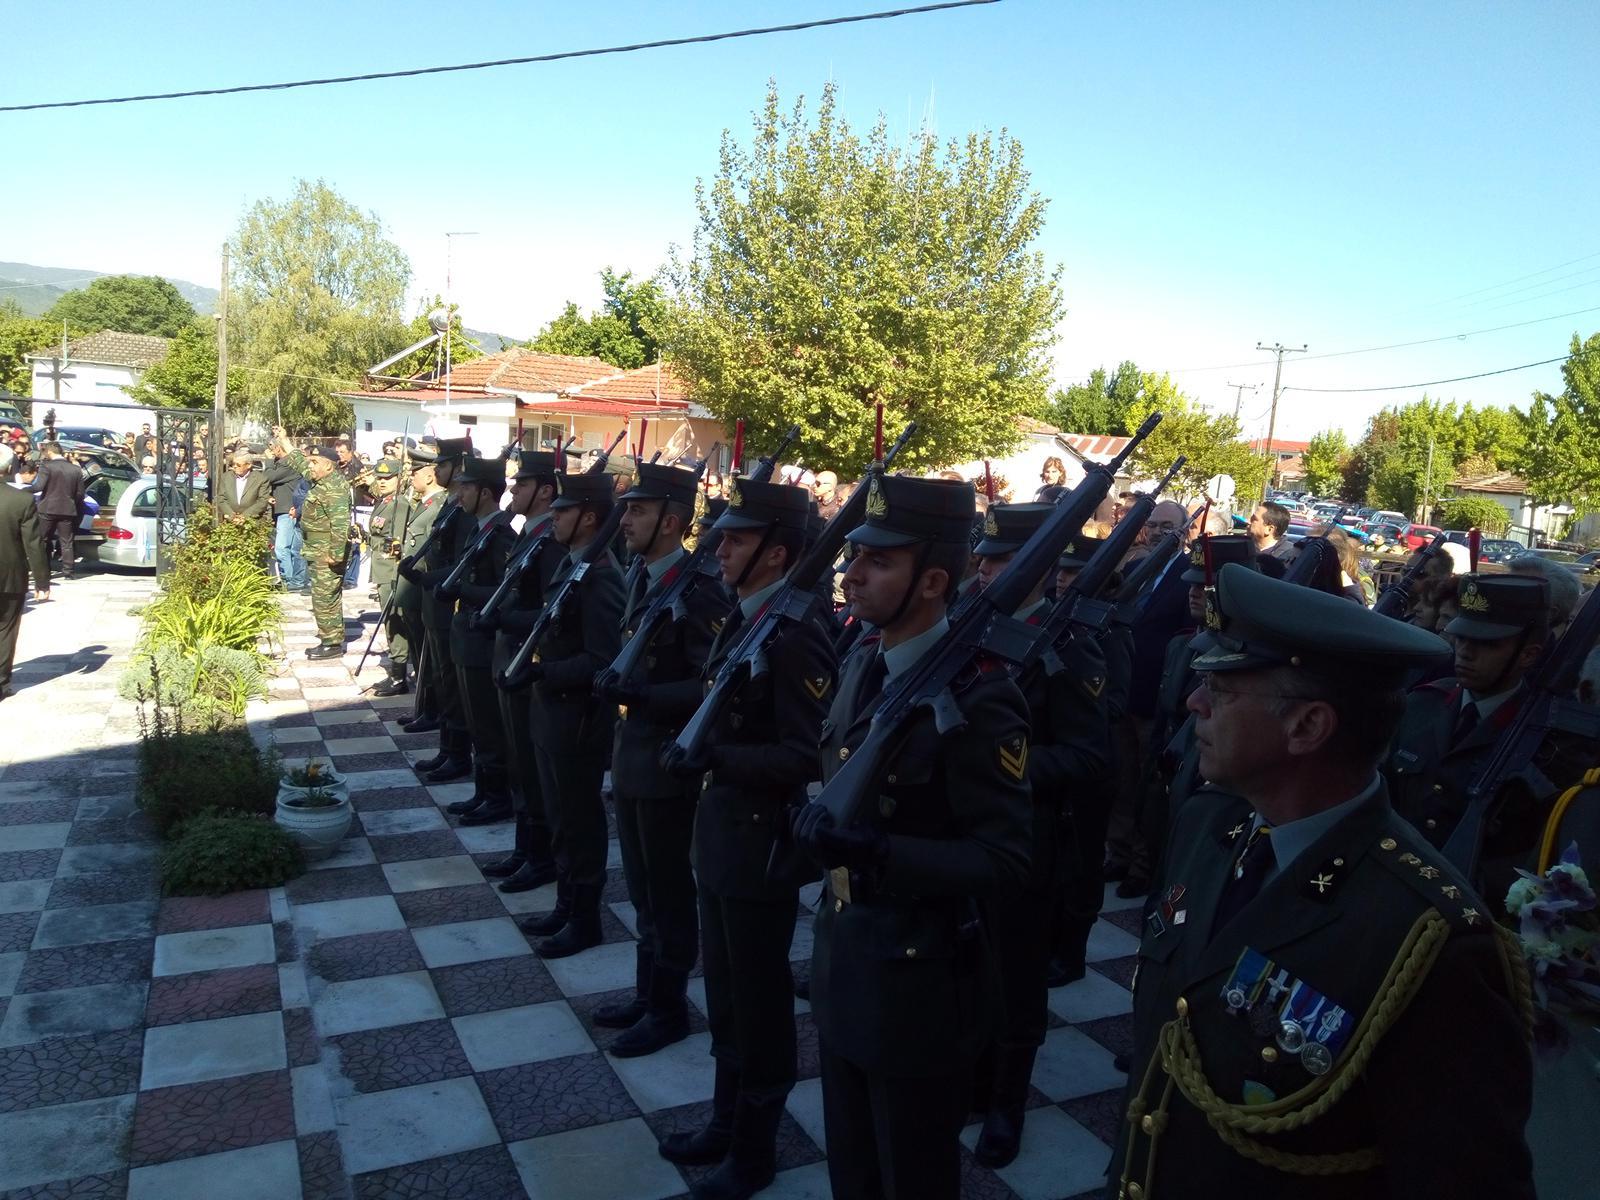 kidieia-paron-eksi Σπαραγμός στις κηδείες των στελεχών των Ενόπλων Δυνάμεων που σκοτώθηκαν με το μοιραίο Χιούι